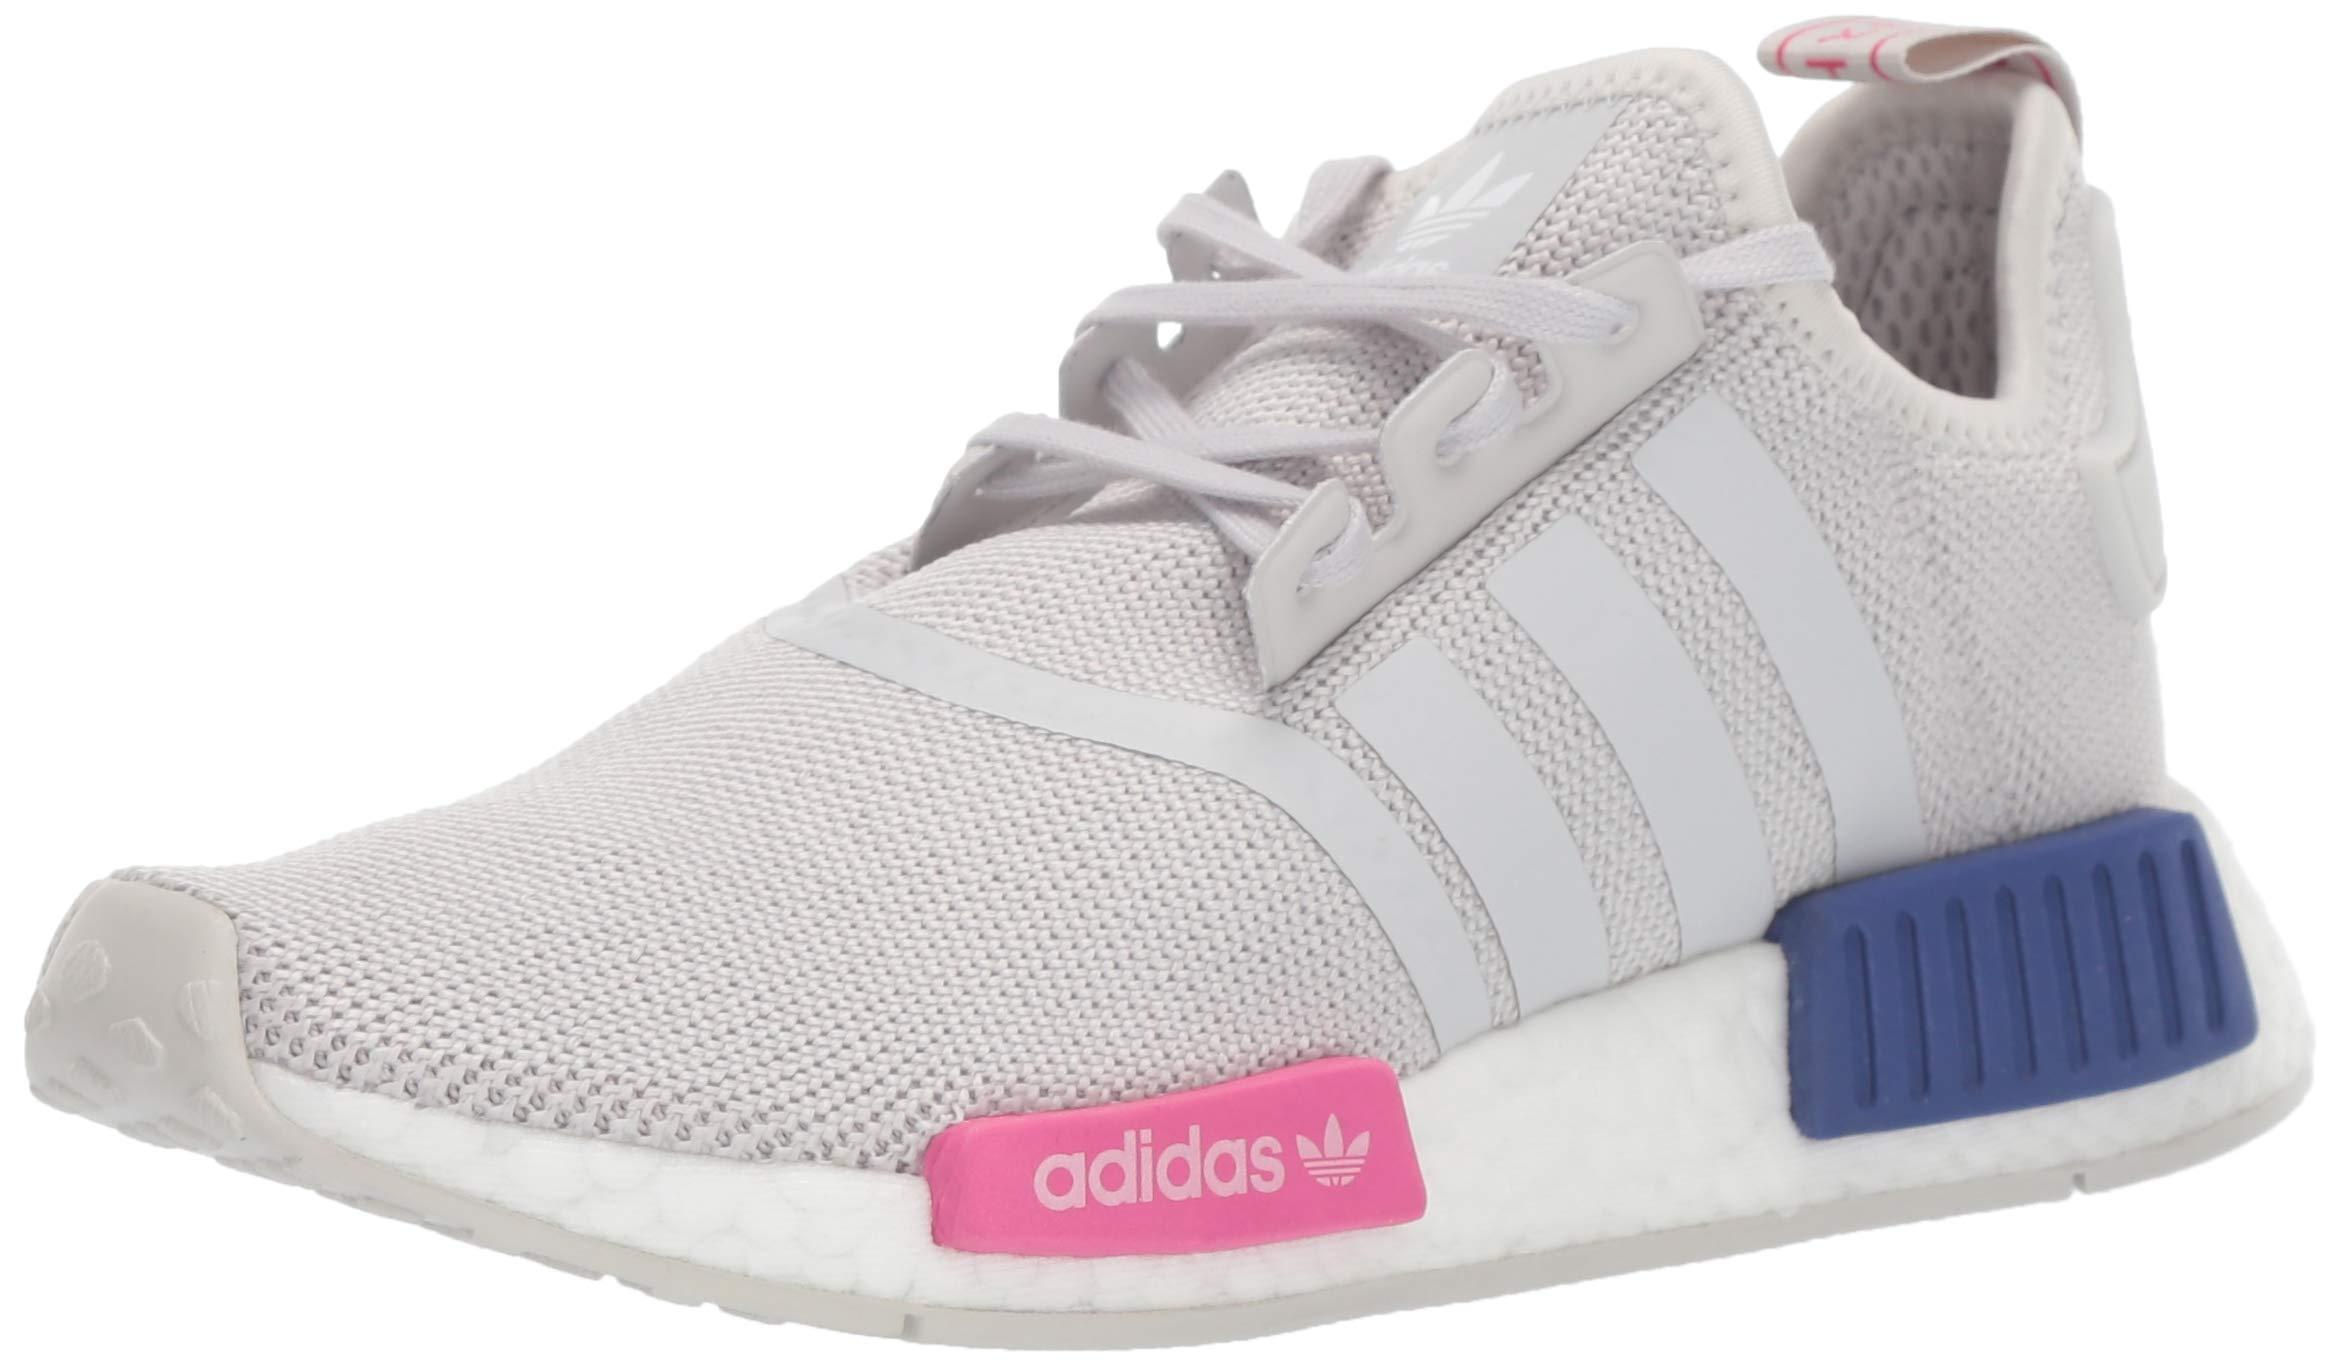 adidas Originals Unisex NMD_R1 Running Shoe, Grey/Shock Pink, 4.5 M US Big Kid by adidas Originals